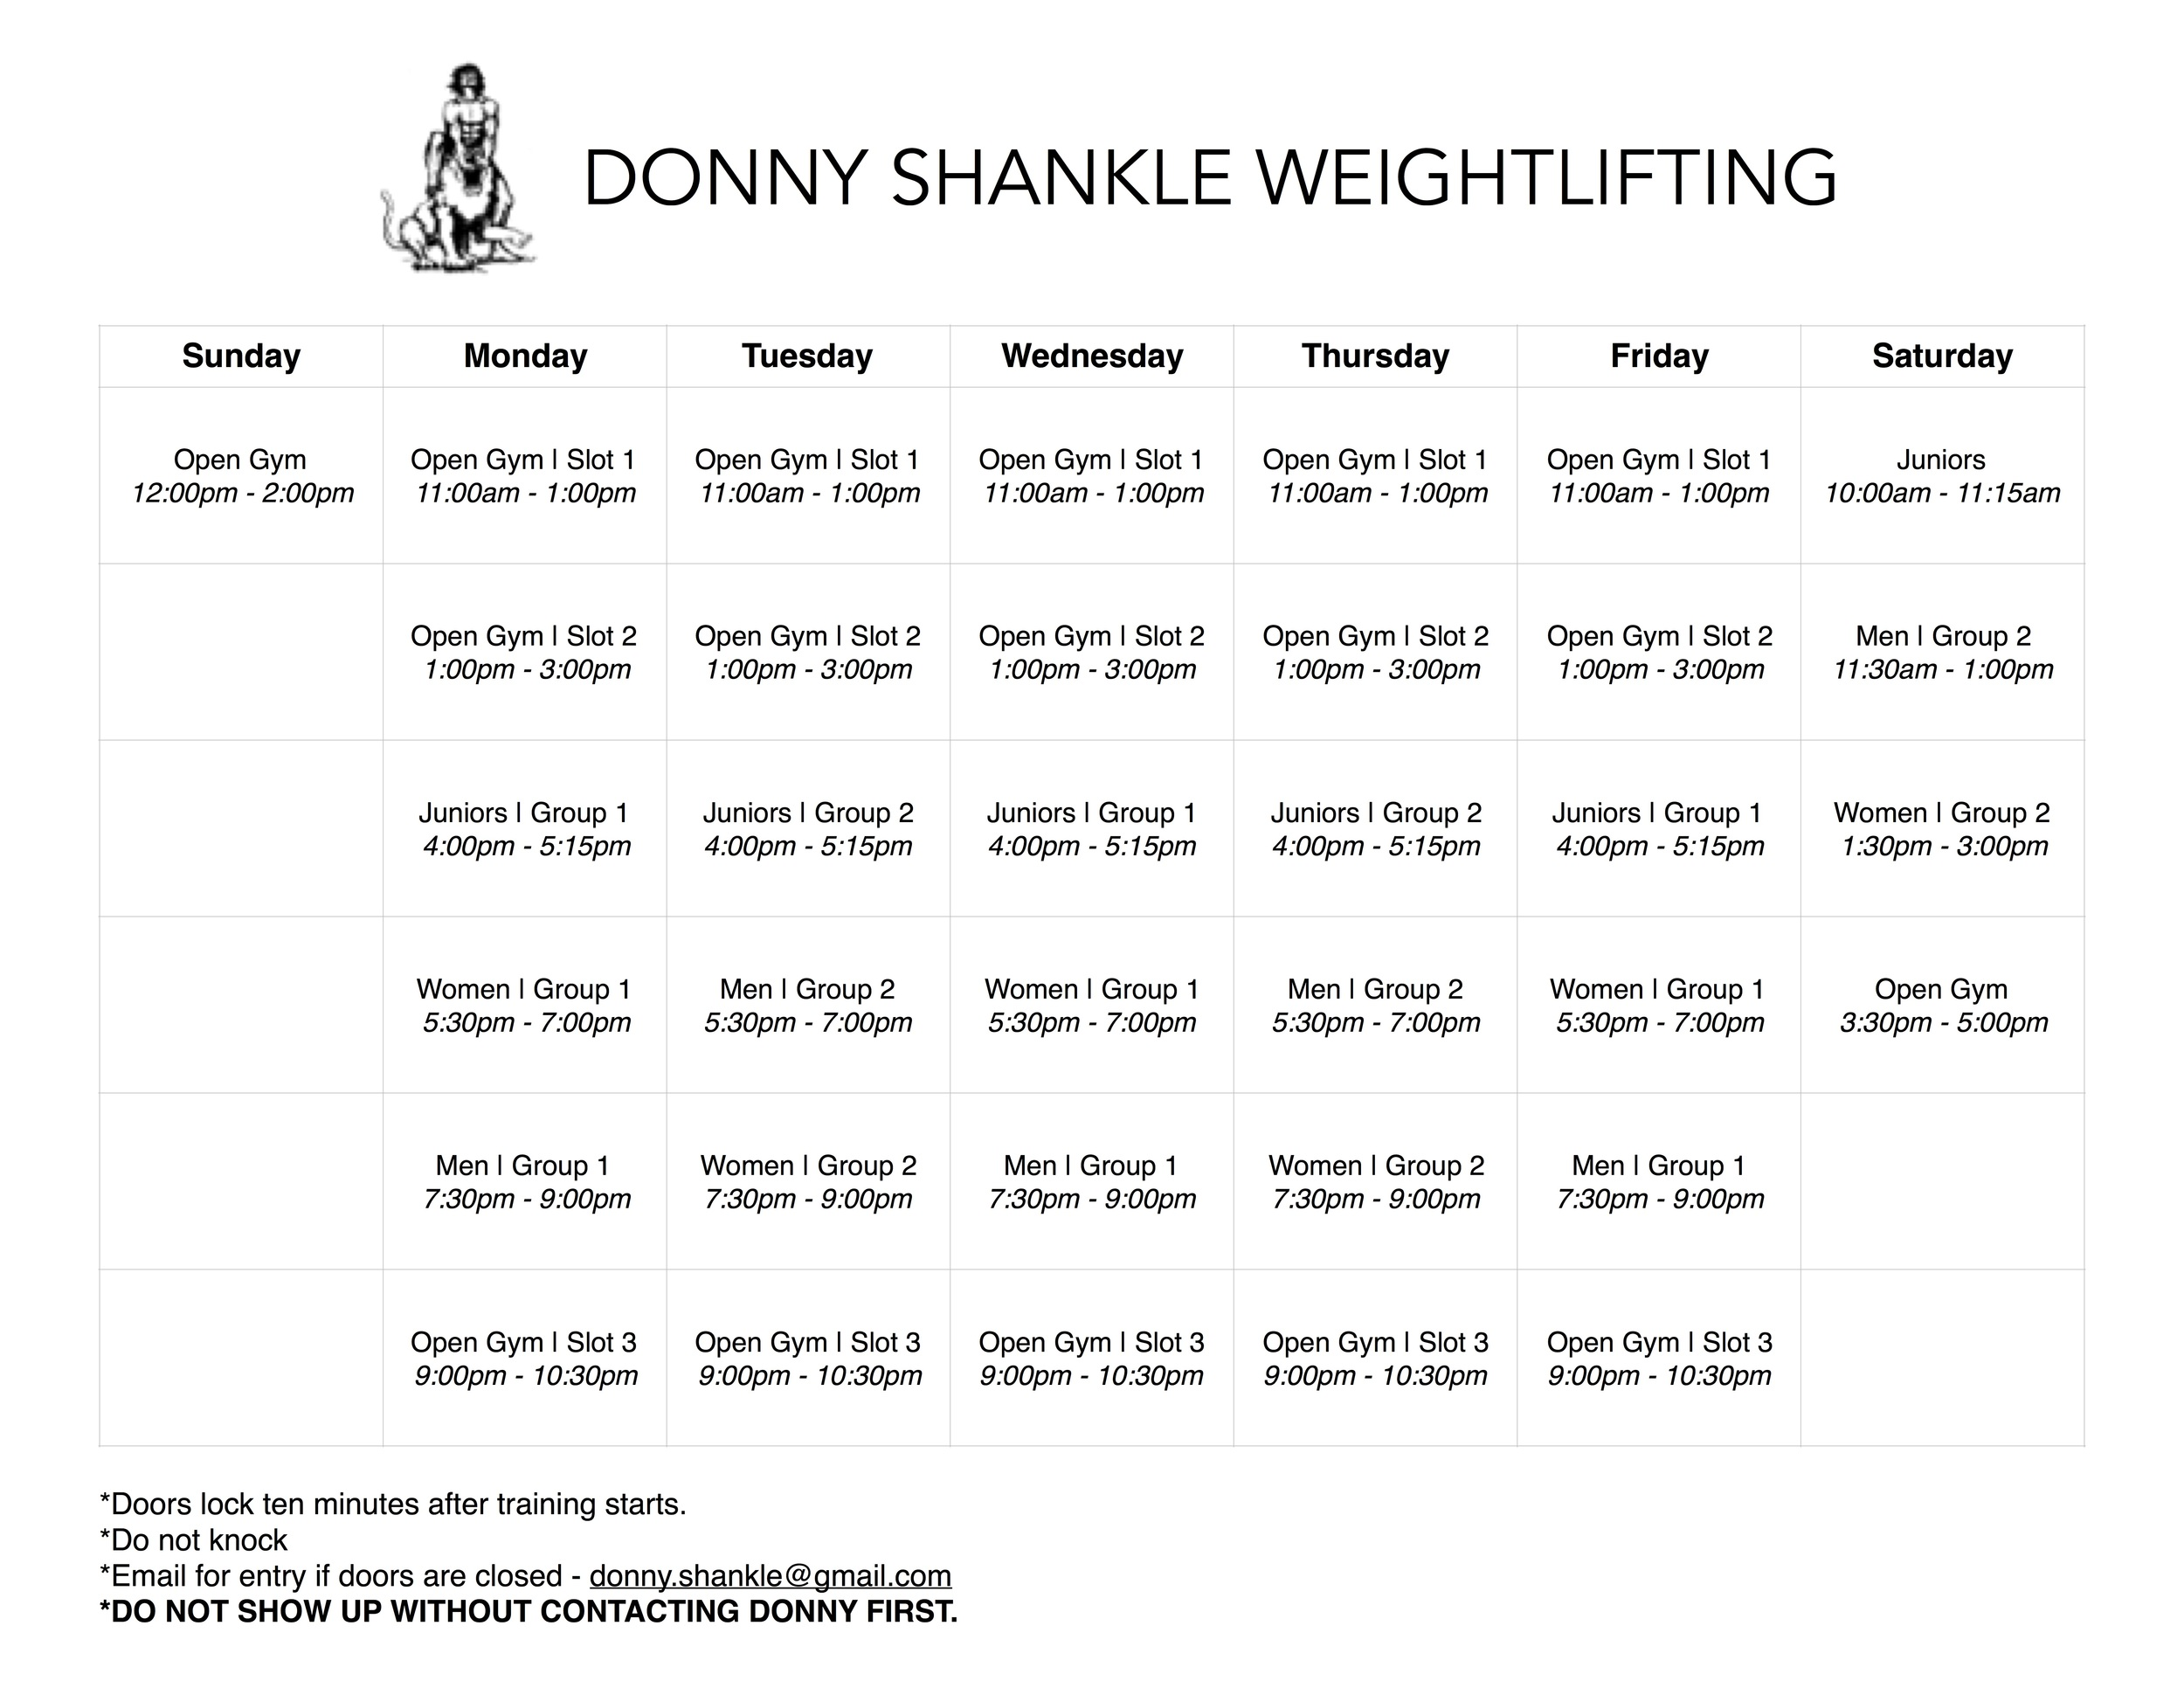 dsw schedule.jpg